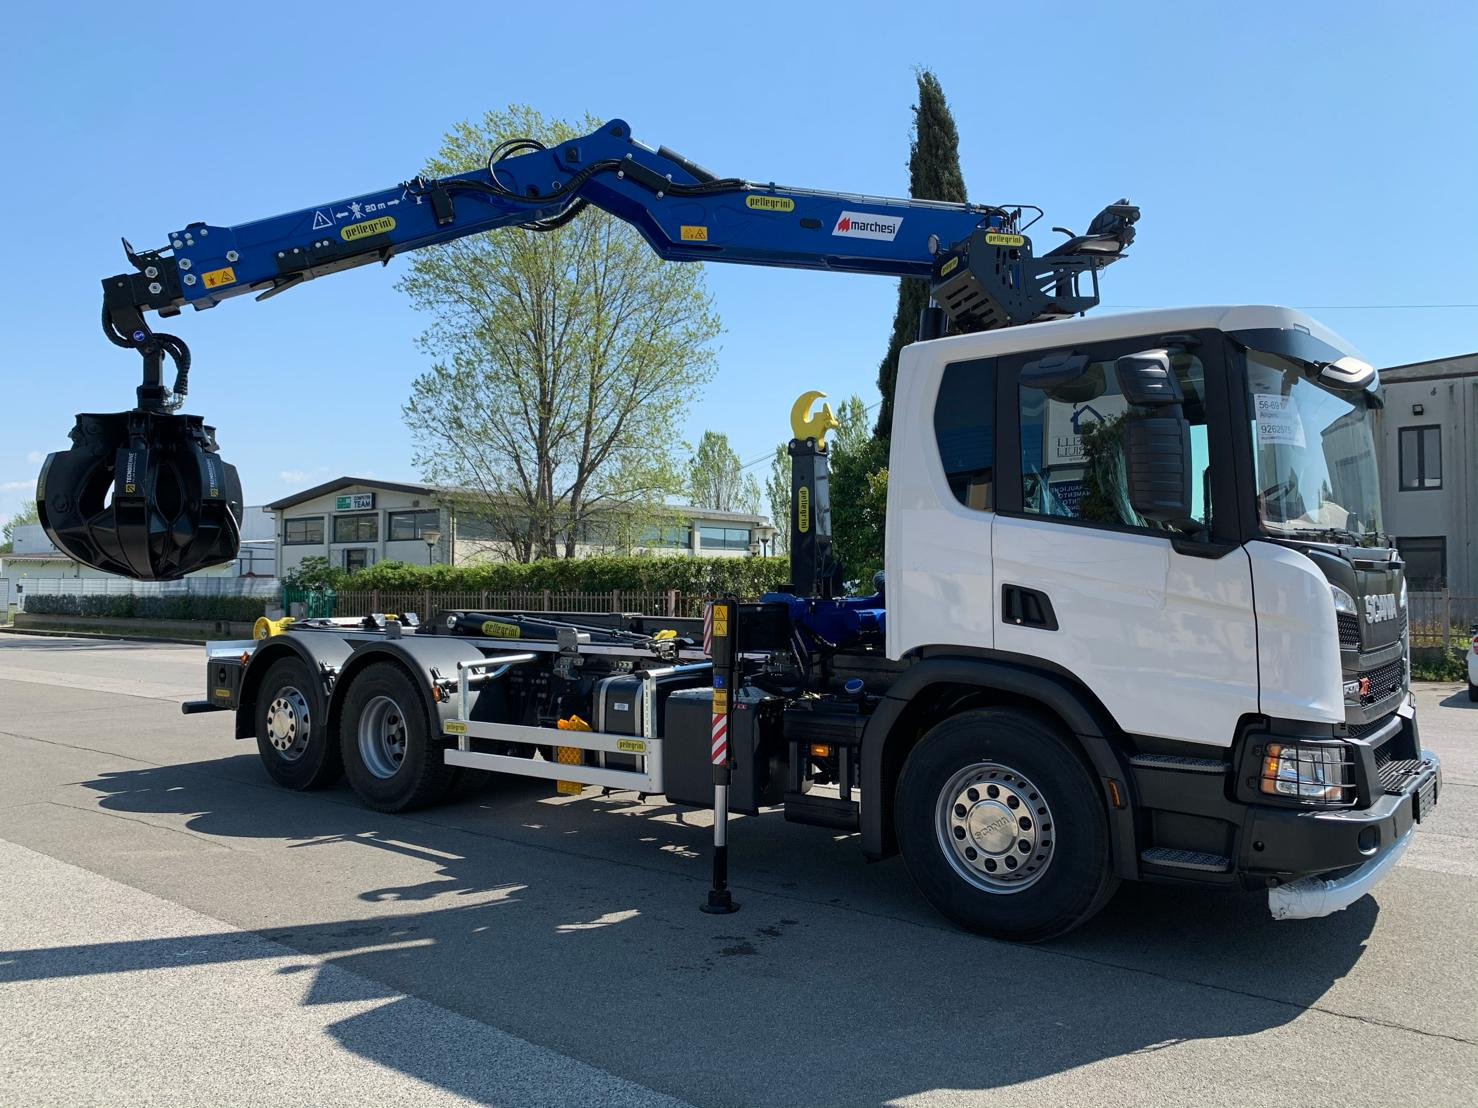 gru per camion-caricatore per camion-allestimento per camion-caricatore ecologia e rottami- marchesigru-pellegrini alestimenti-